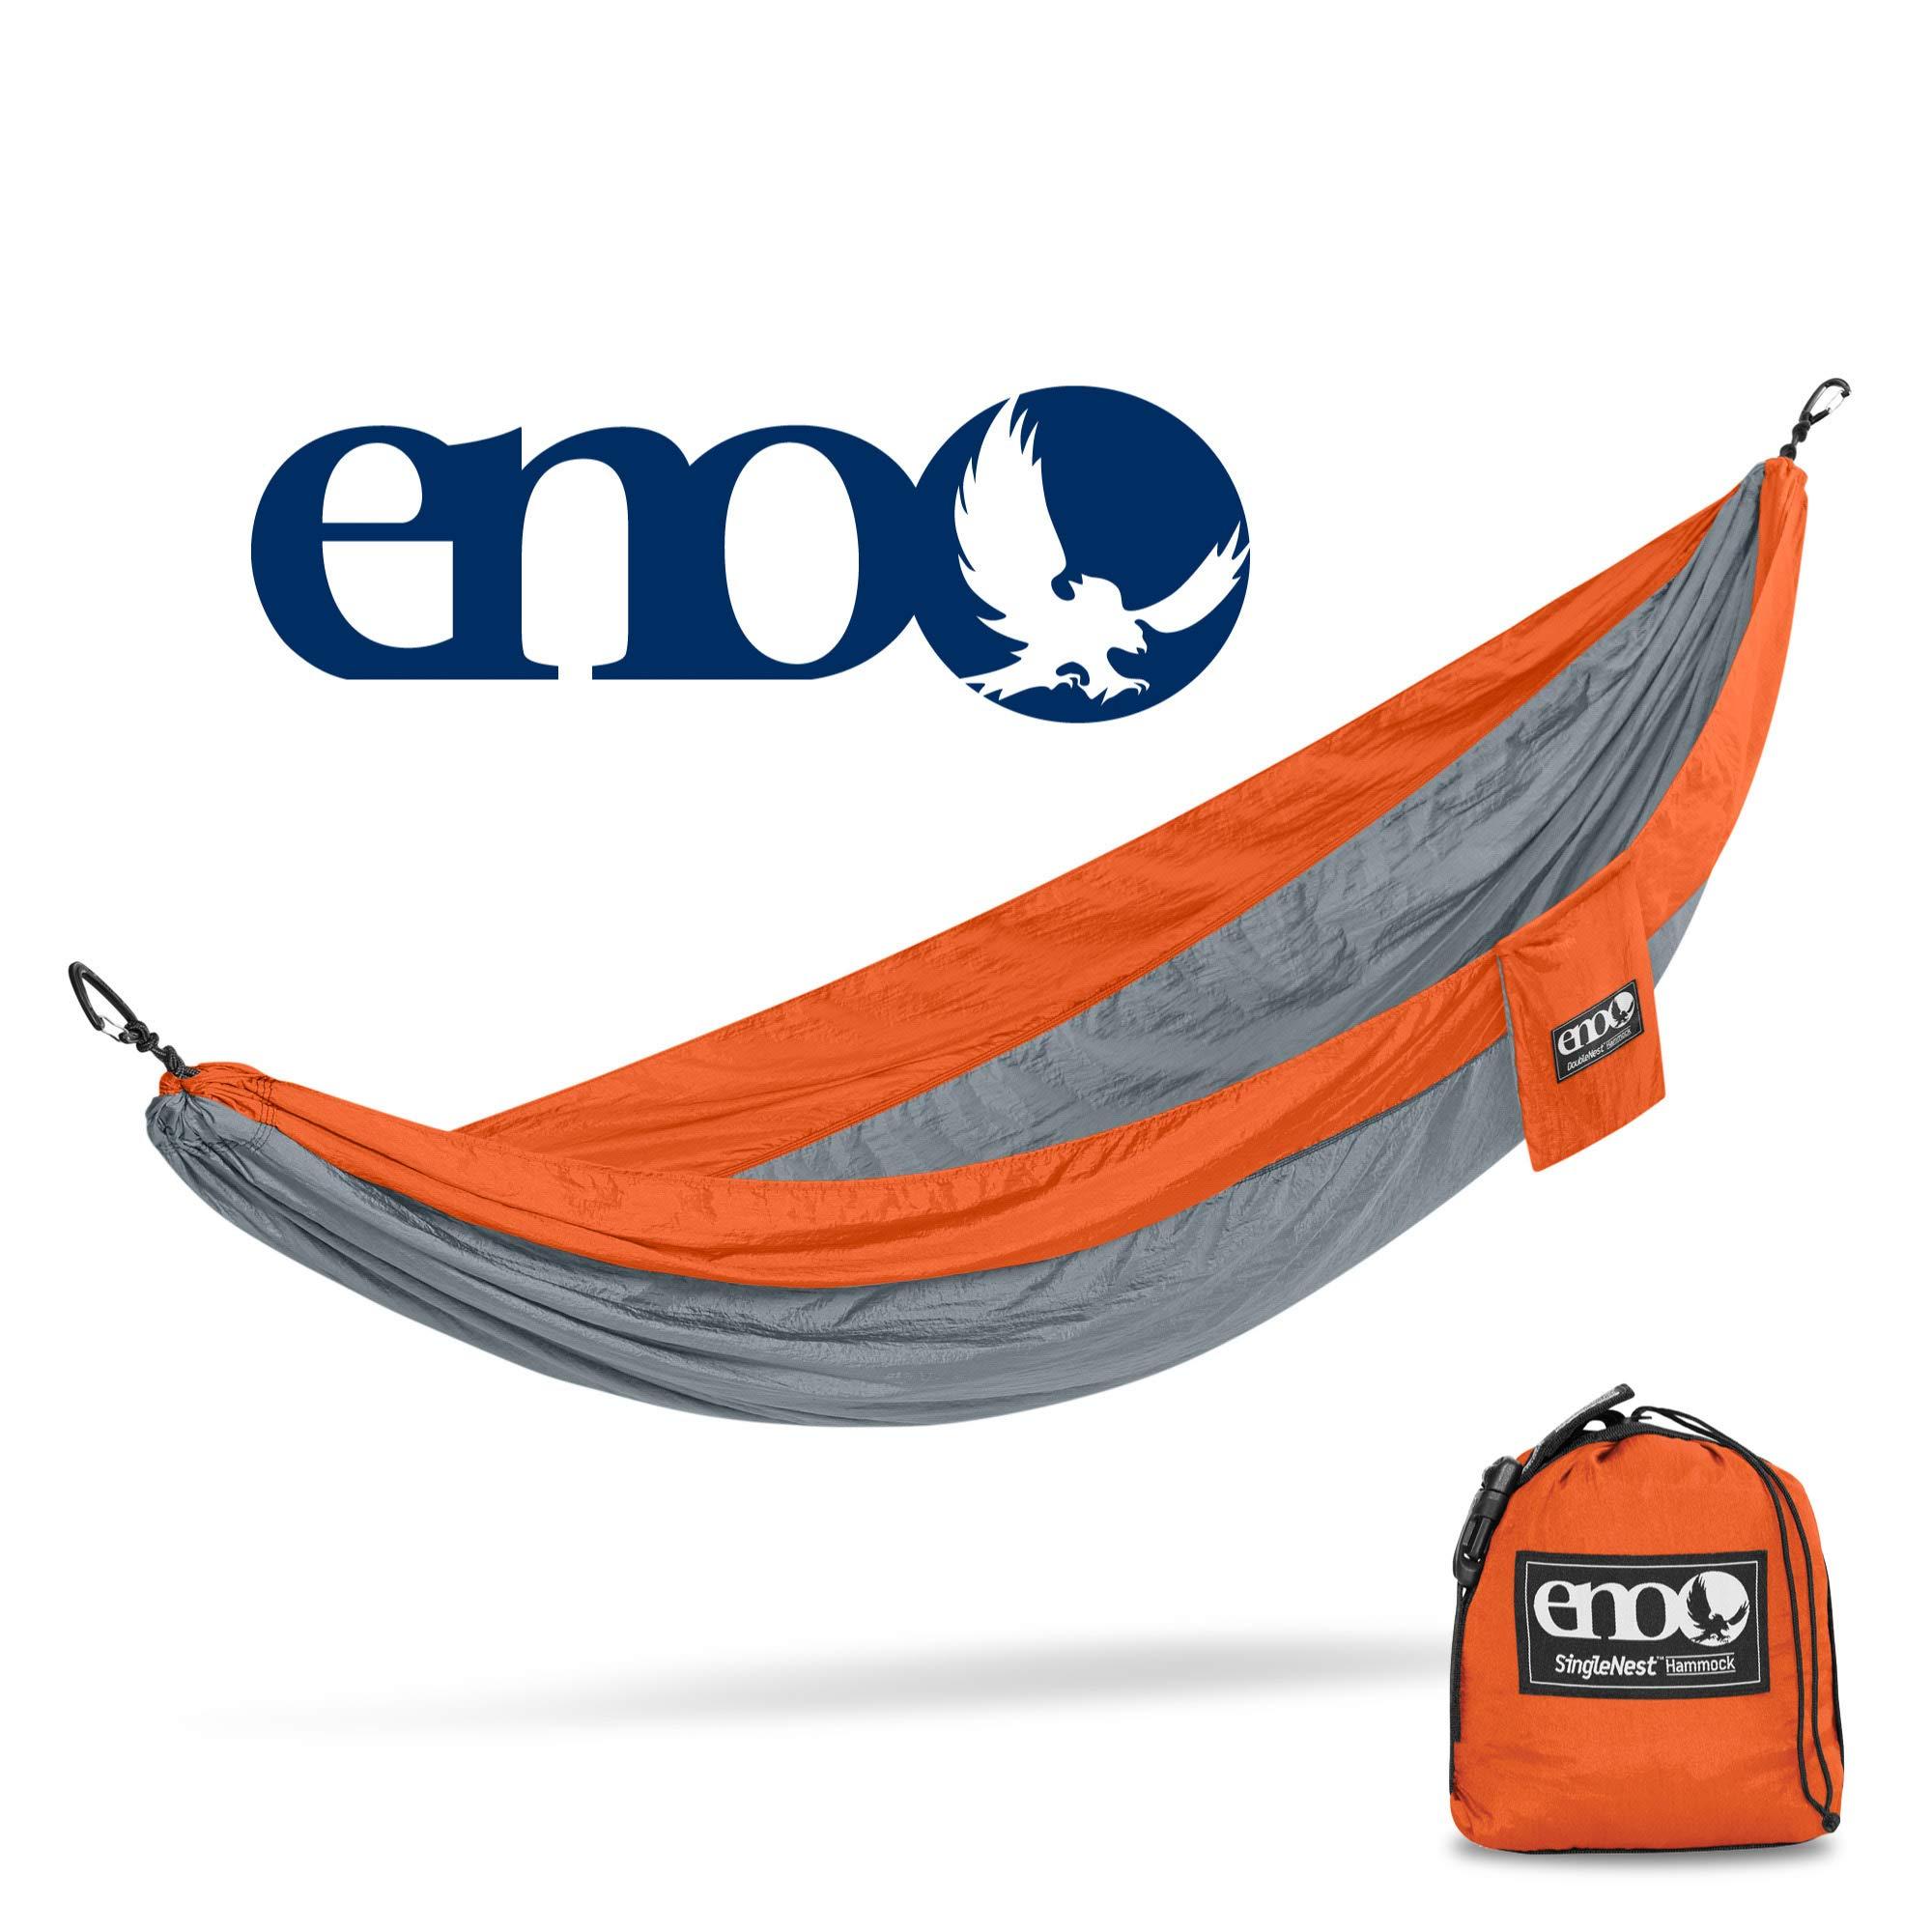 ENO - Eagles Nest Outfitters SingleNest Hammock, Portable Hammock for One, Orange/Grey